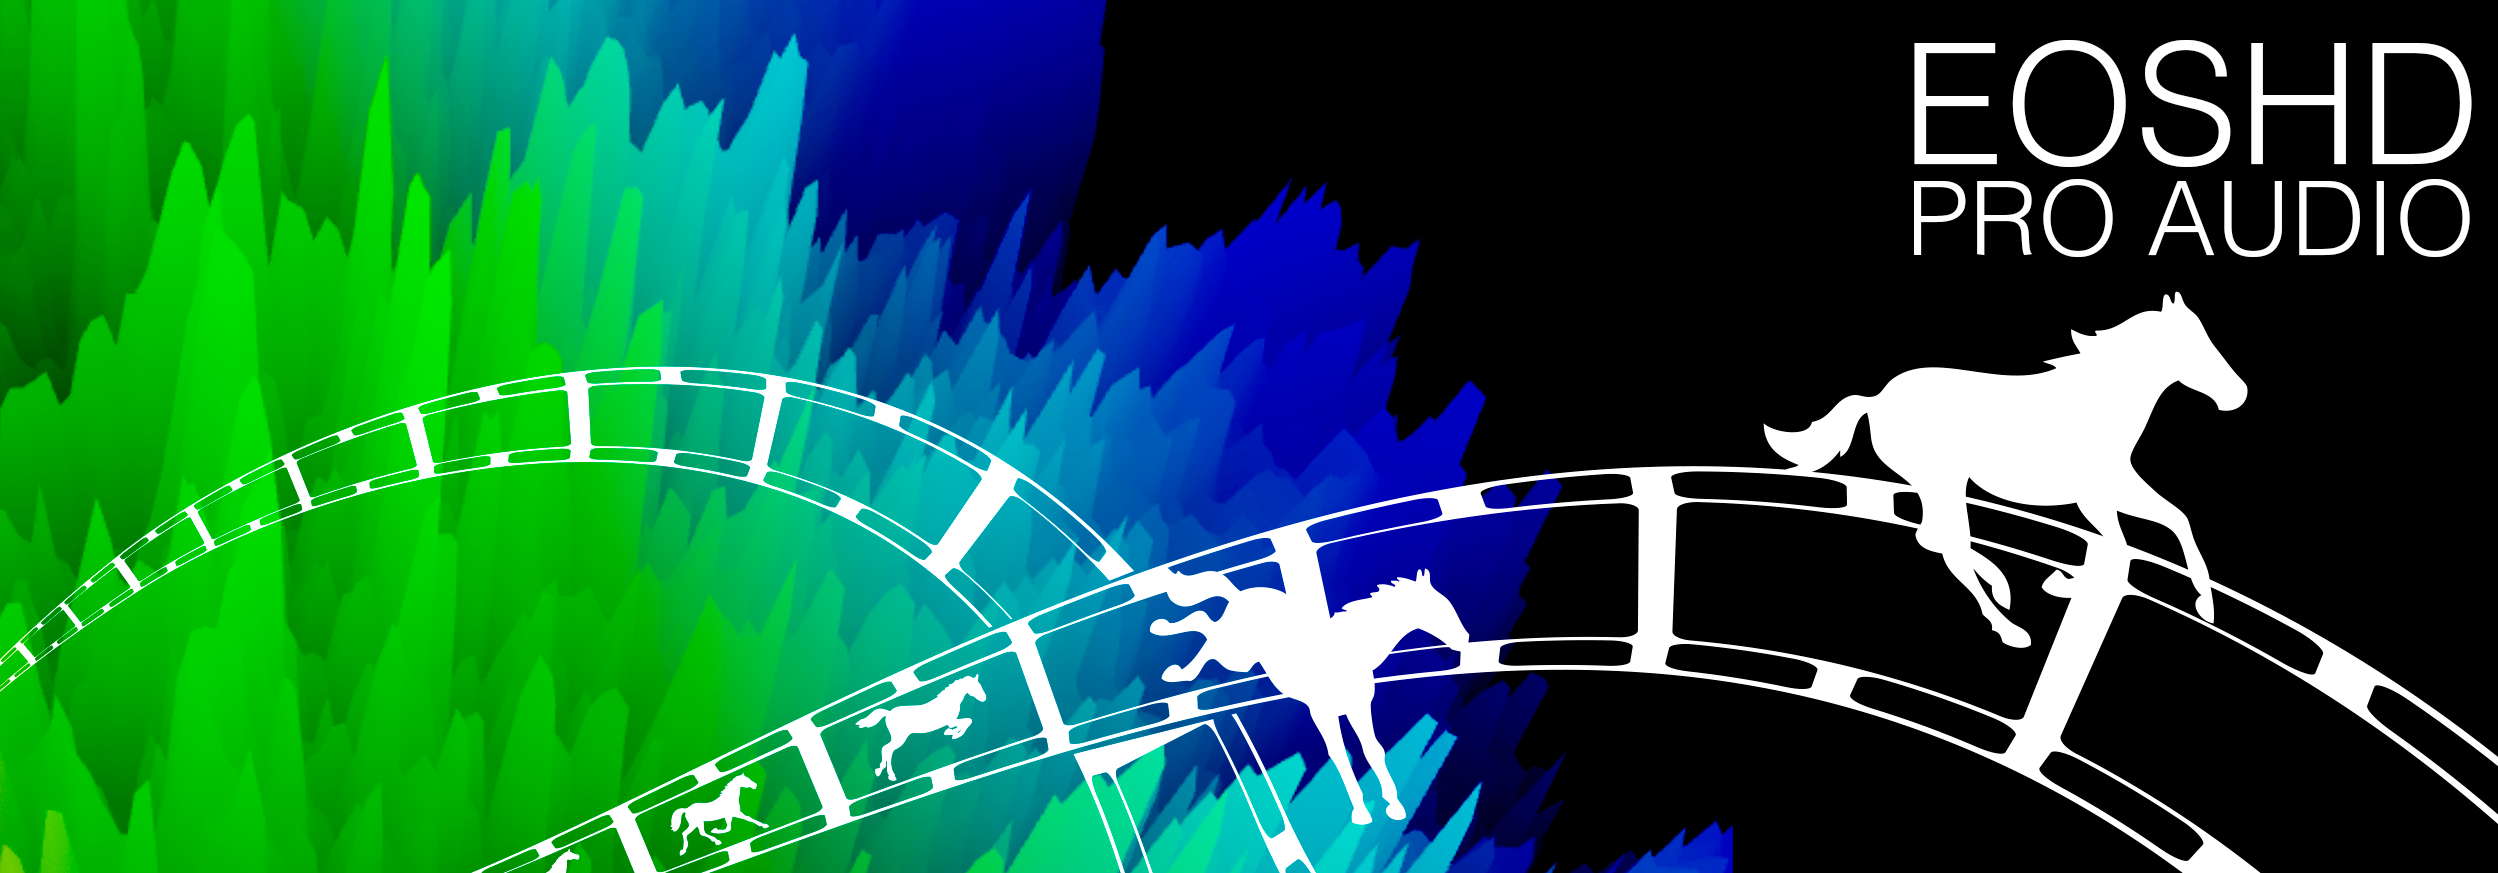 EOSHD-Pro-Audio-Banner-V4.png